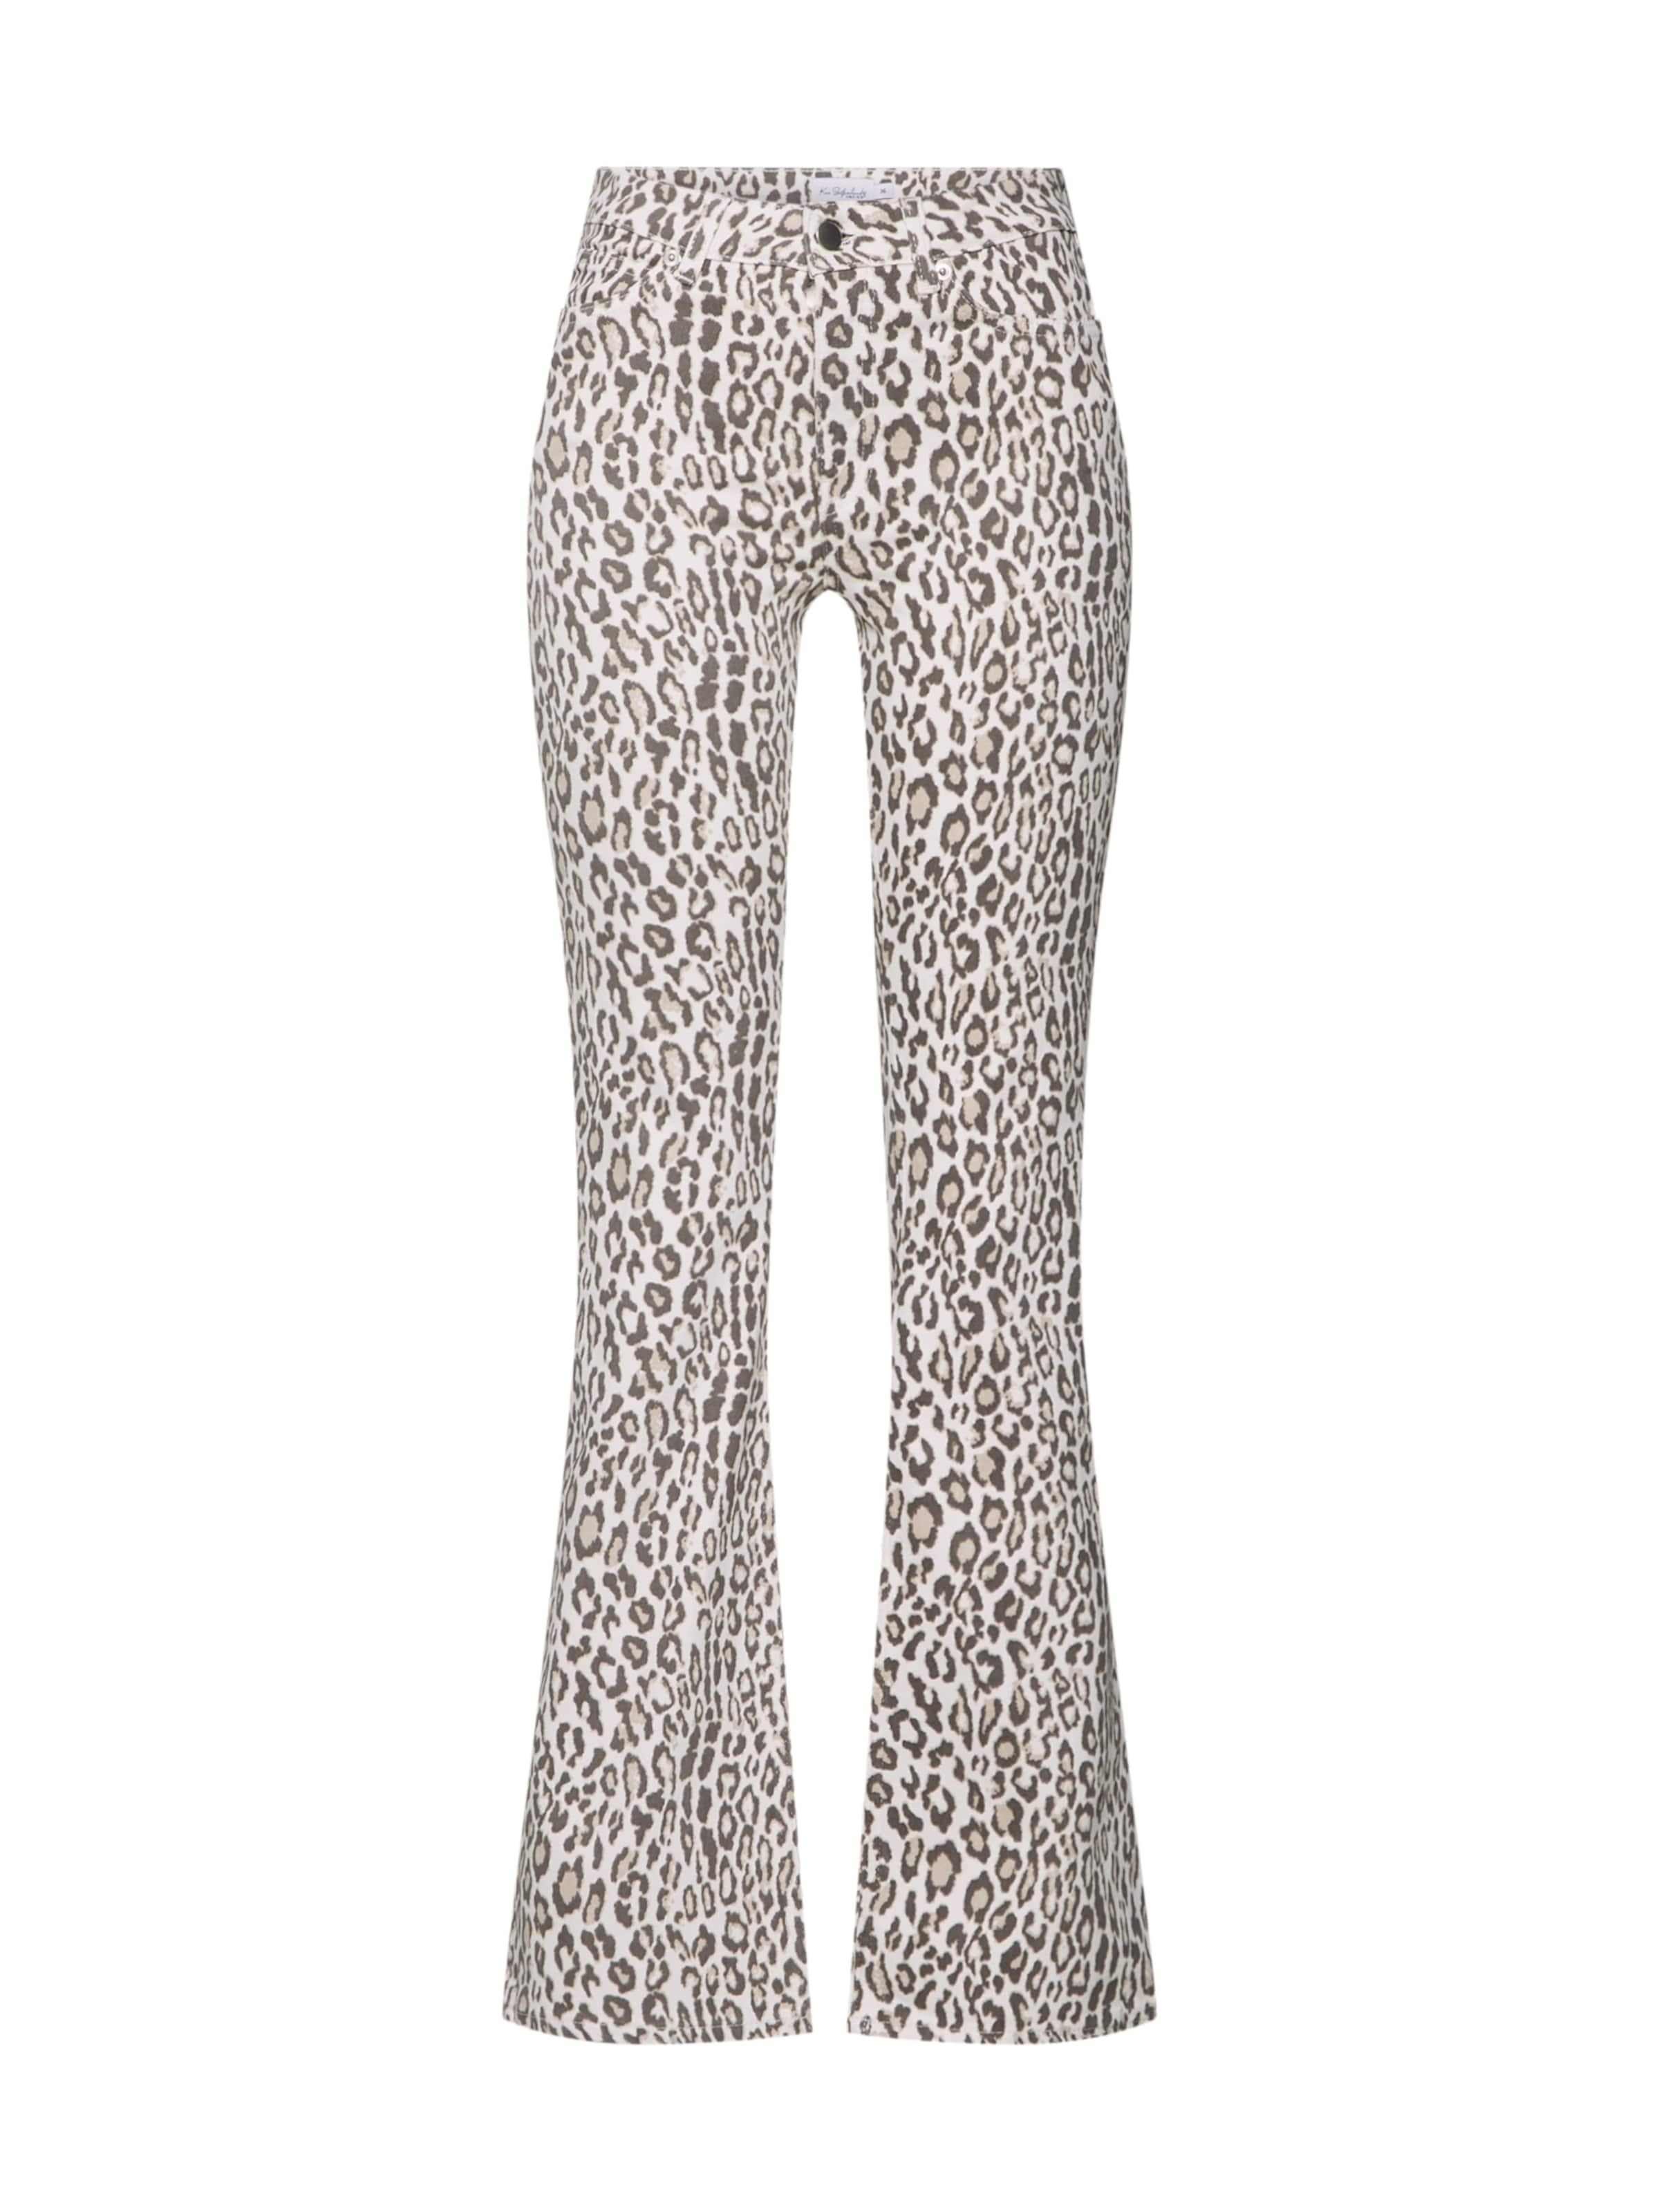 Na In Jeans kd 'leopard' BraunWeiß 9HEID2